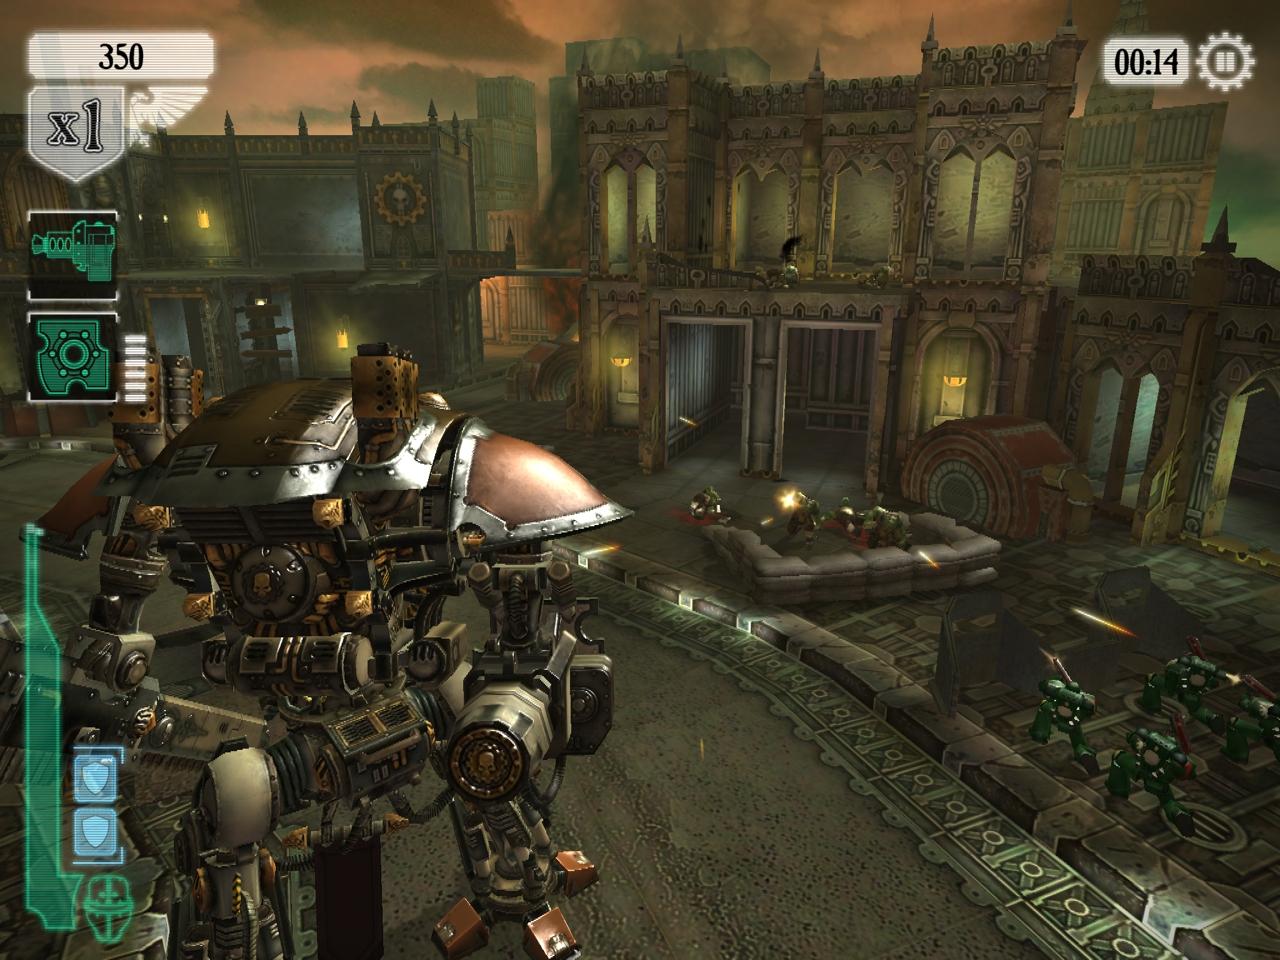 Warhammer 40,000: Freeblade - Killing in the free worlds